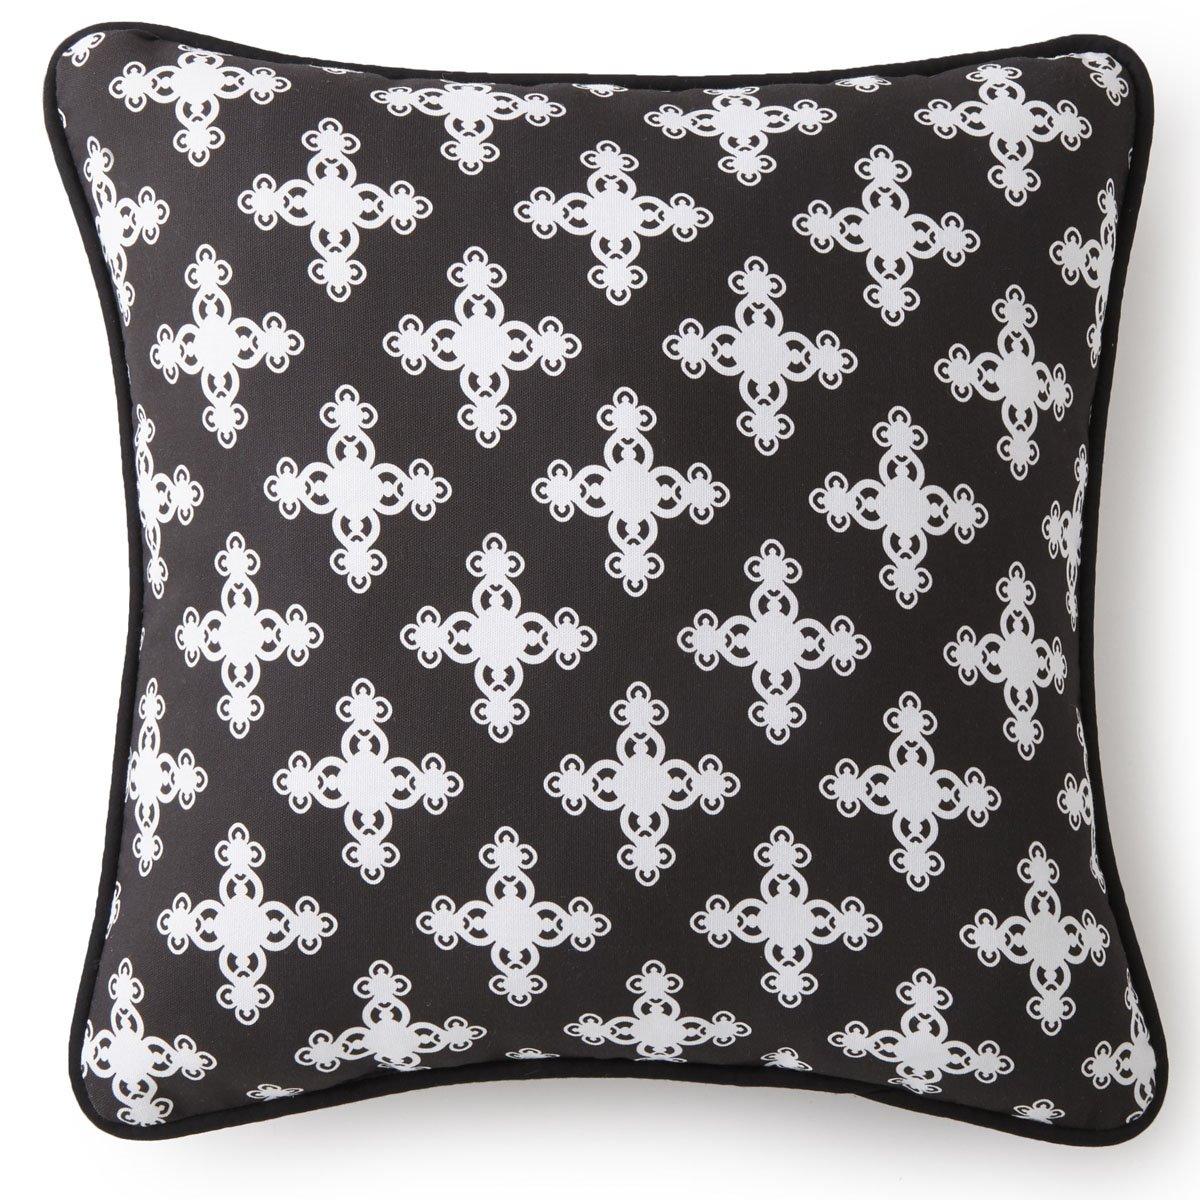 "Scrollwork Square Cushion 20""x20"" - Cross Pattern"